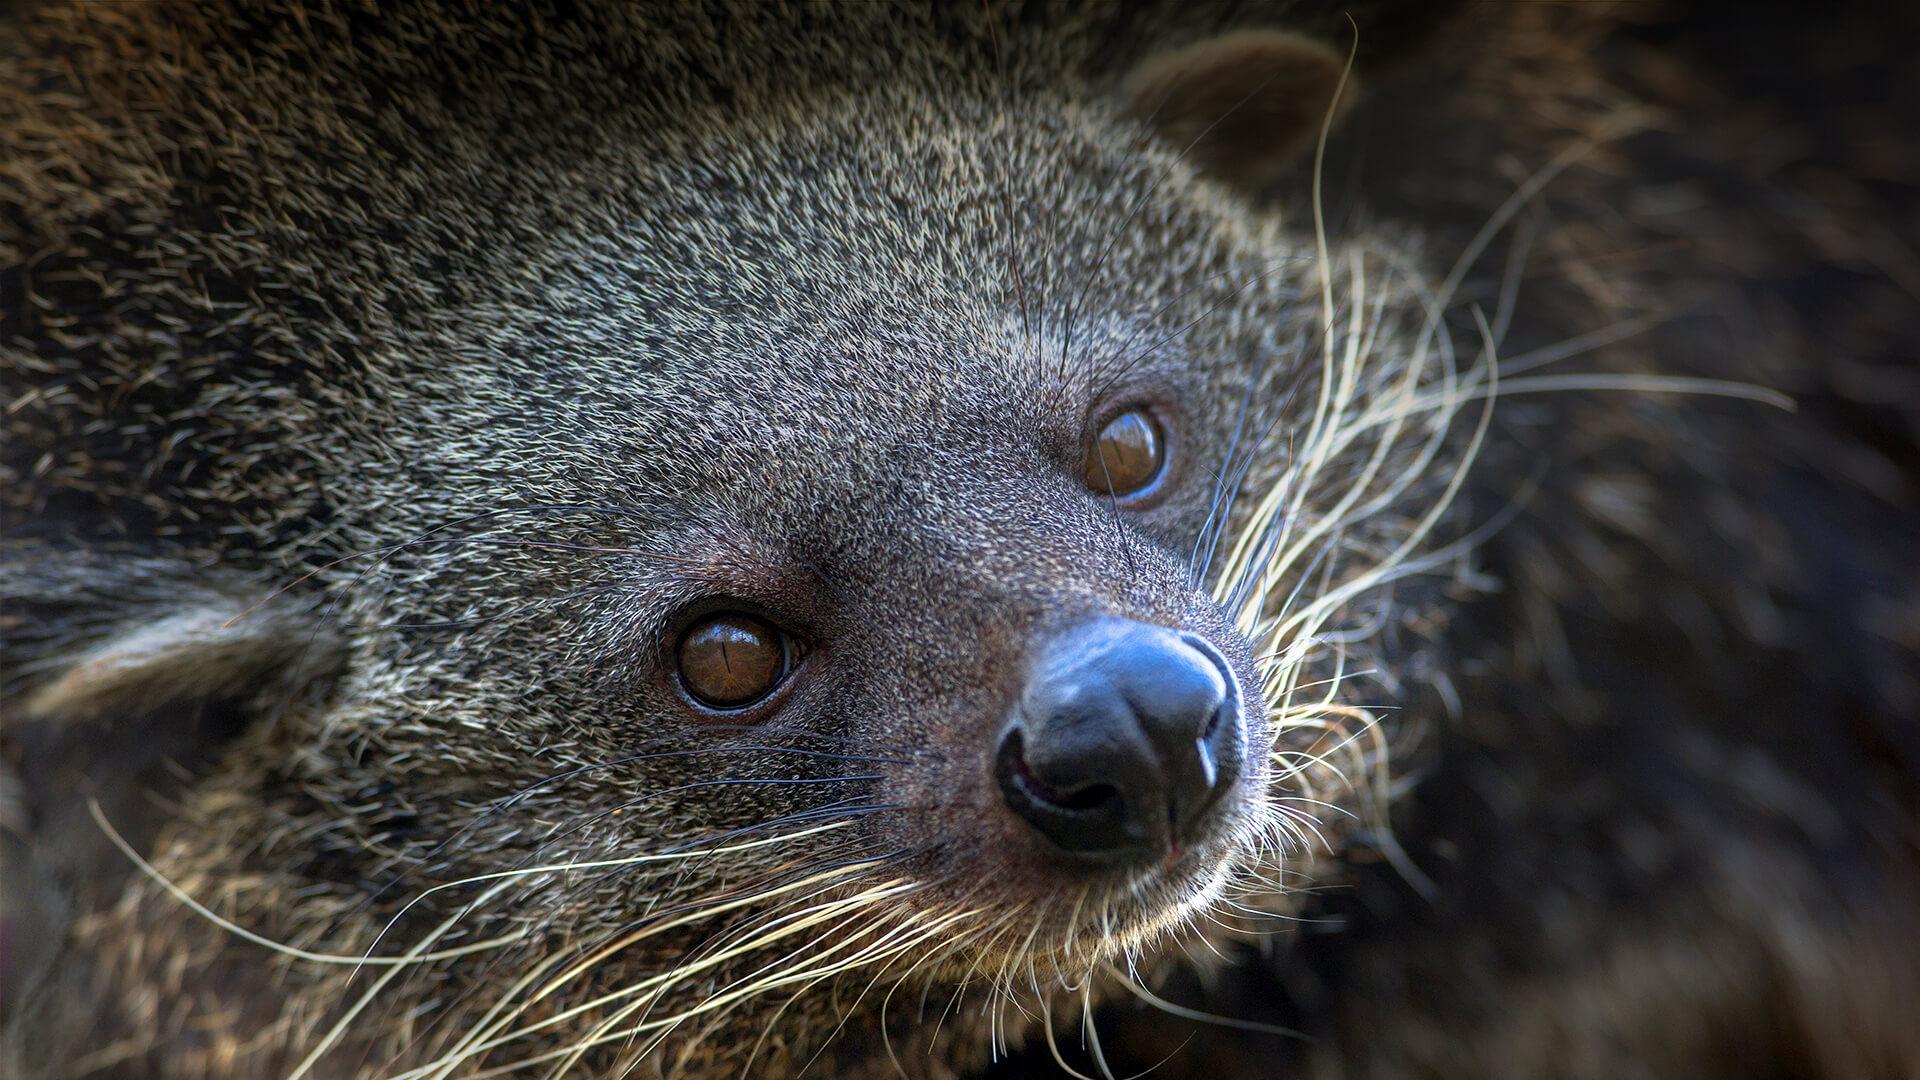 Black Cat Eyes Wallpaper Binturong San Diego Zoo Animals Amp Plants